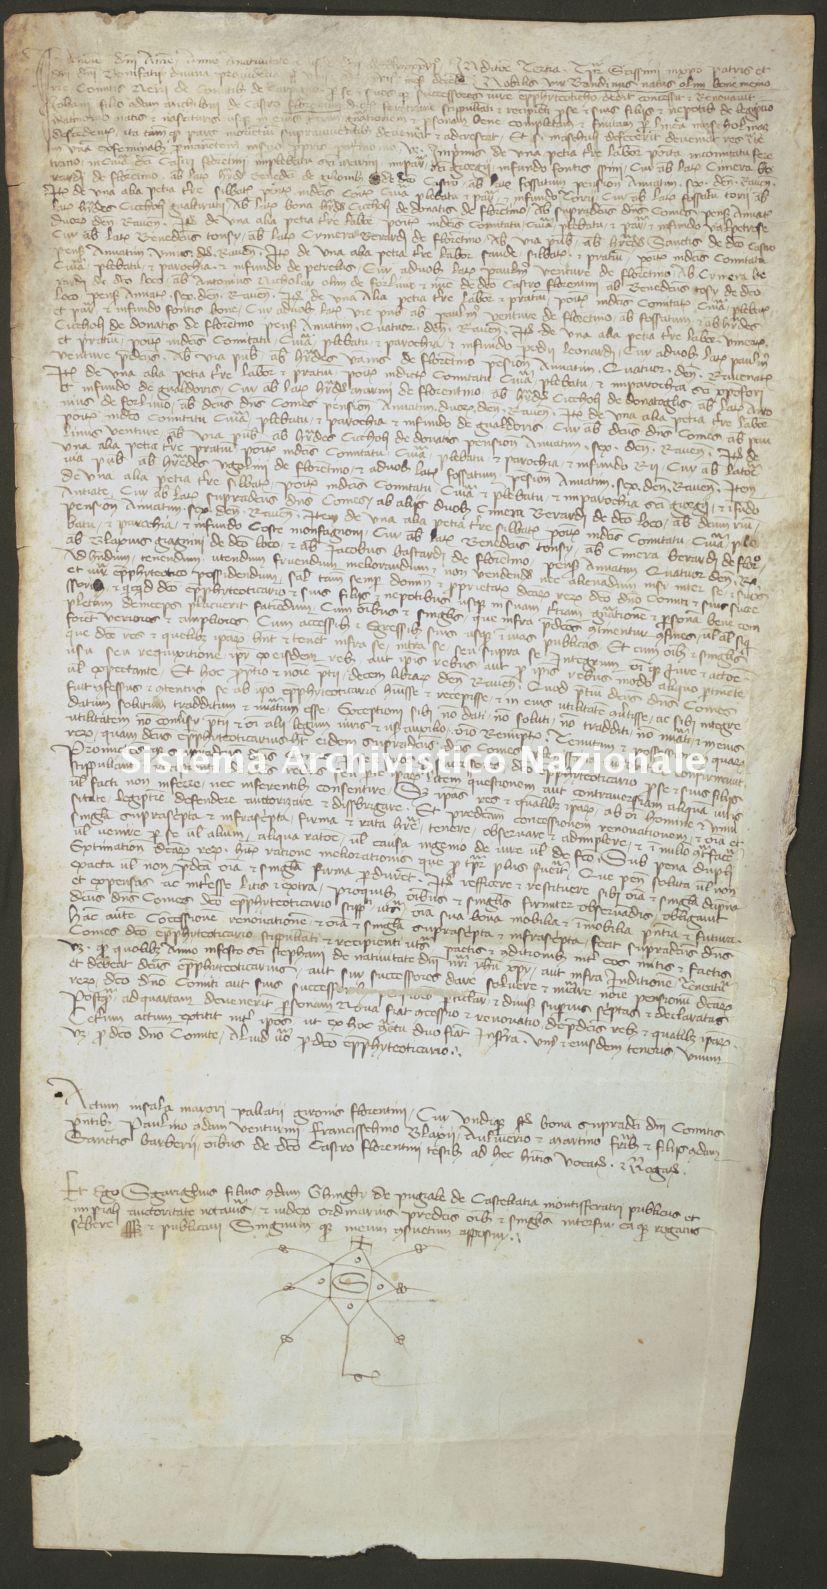 014. Carpegna Falconieri Gabrielli, Scavolino, pergamena n. 14r